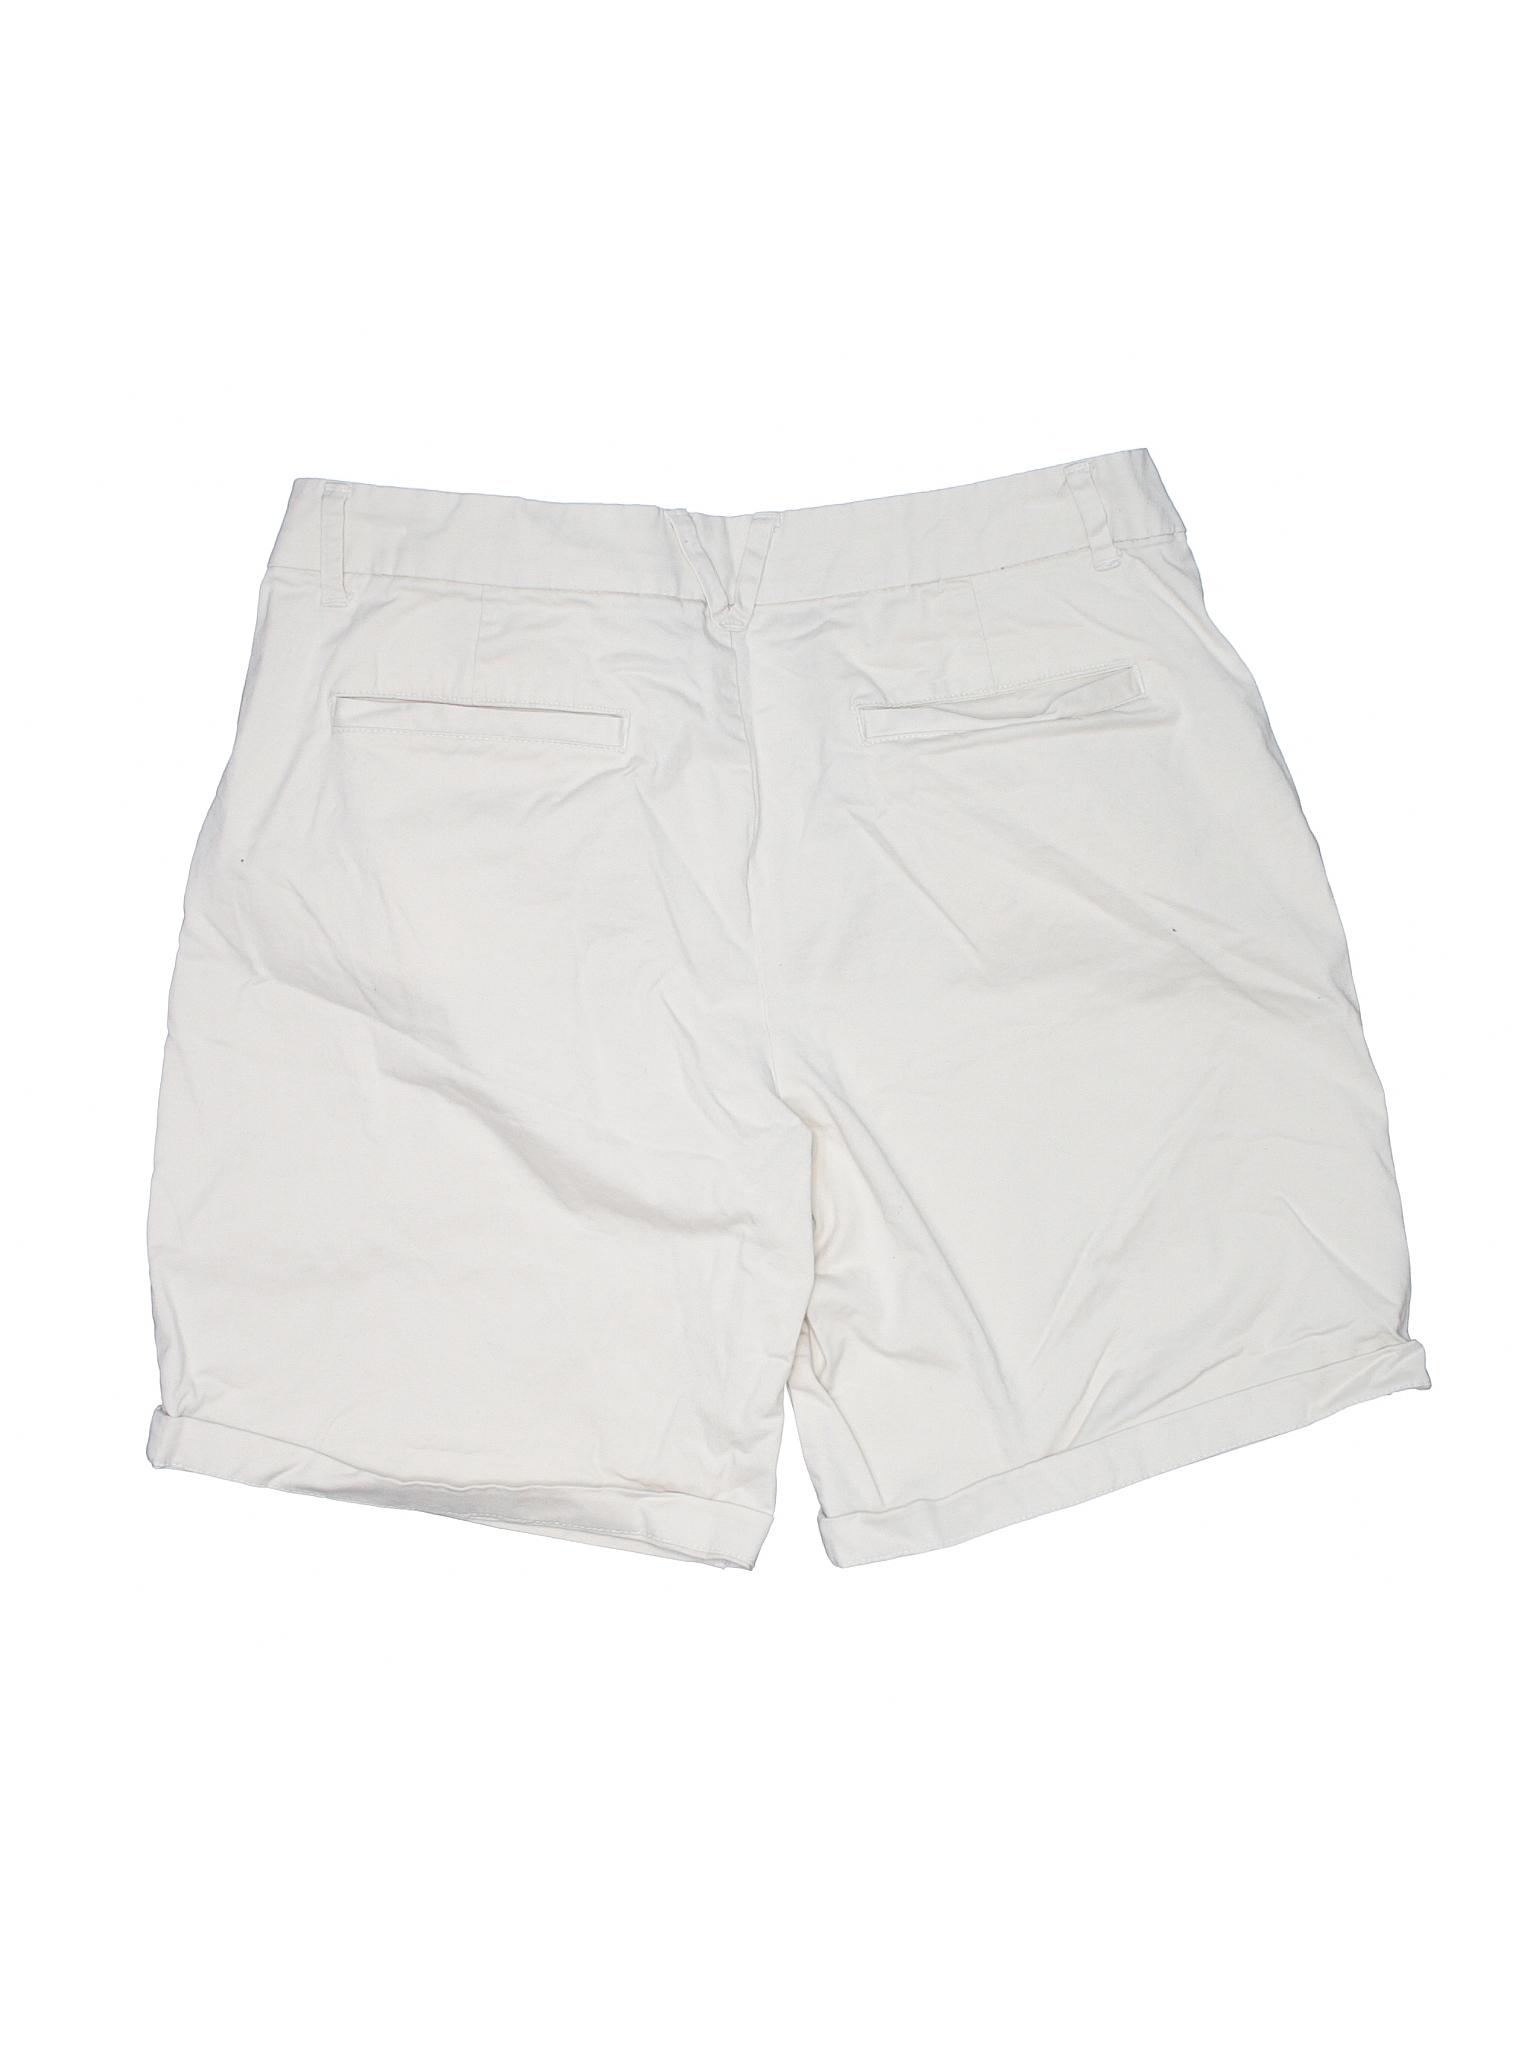 Gap Boutique Shorts Shorts Gap Boutique Khaki Khaki Boutique Gap xZ7SFqwY